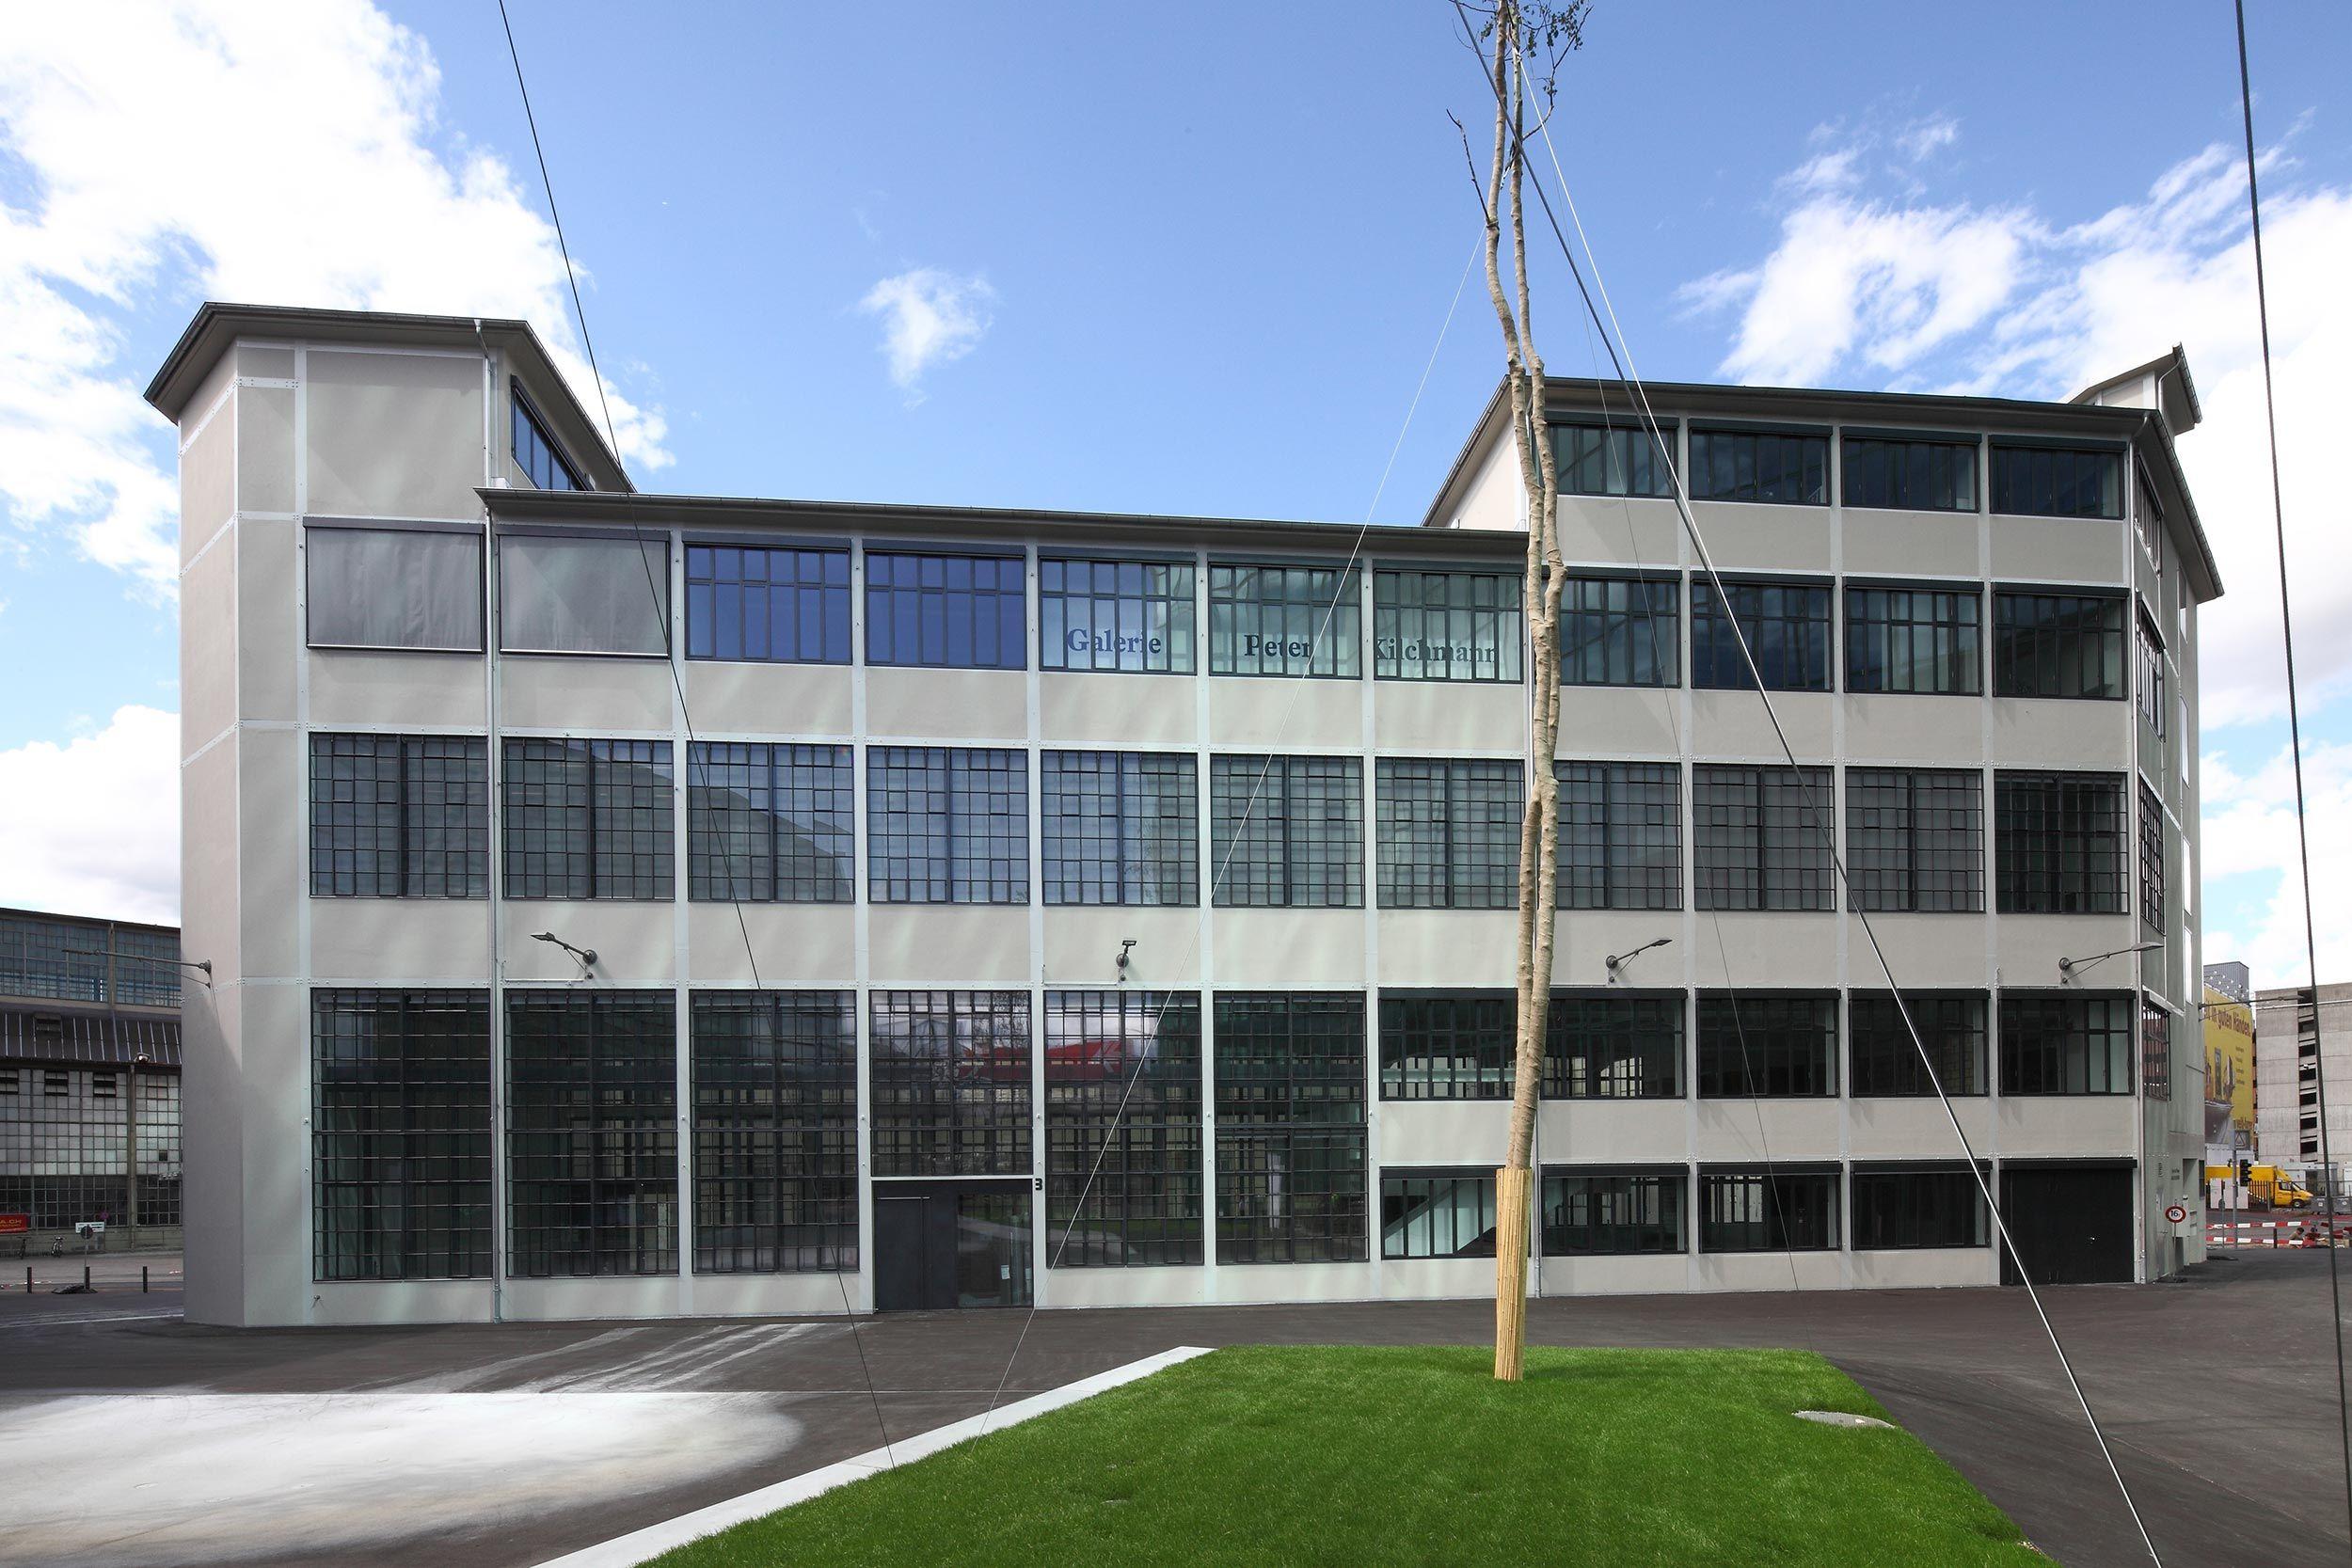 Umbau ehemaliges Industriegebäude Diagonal, Maag-Areal